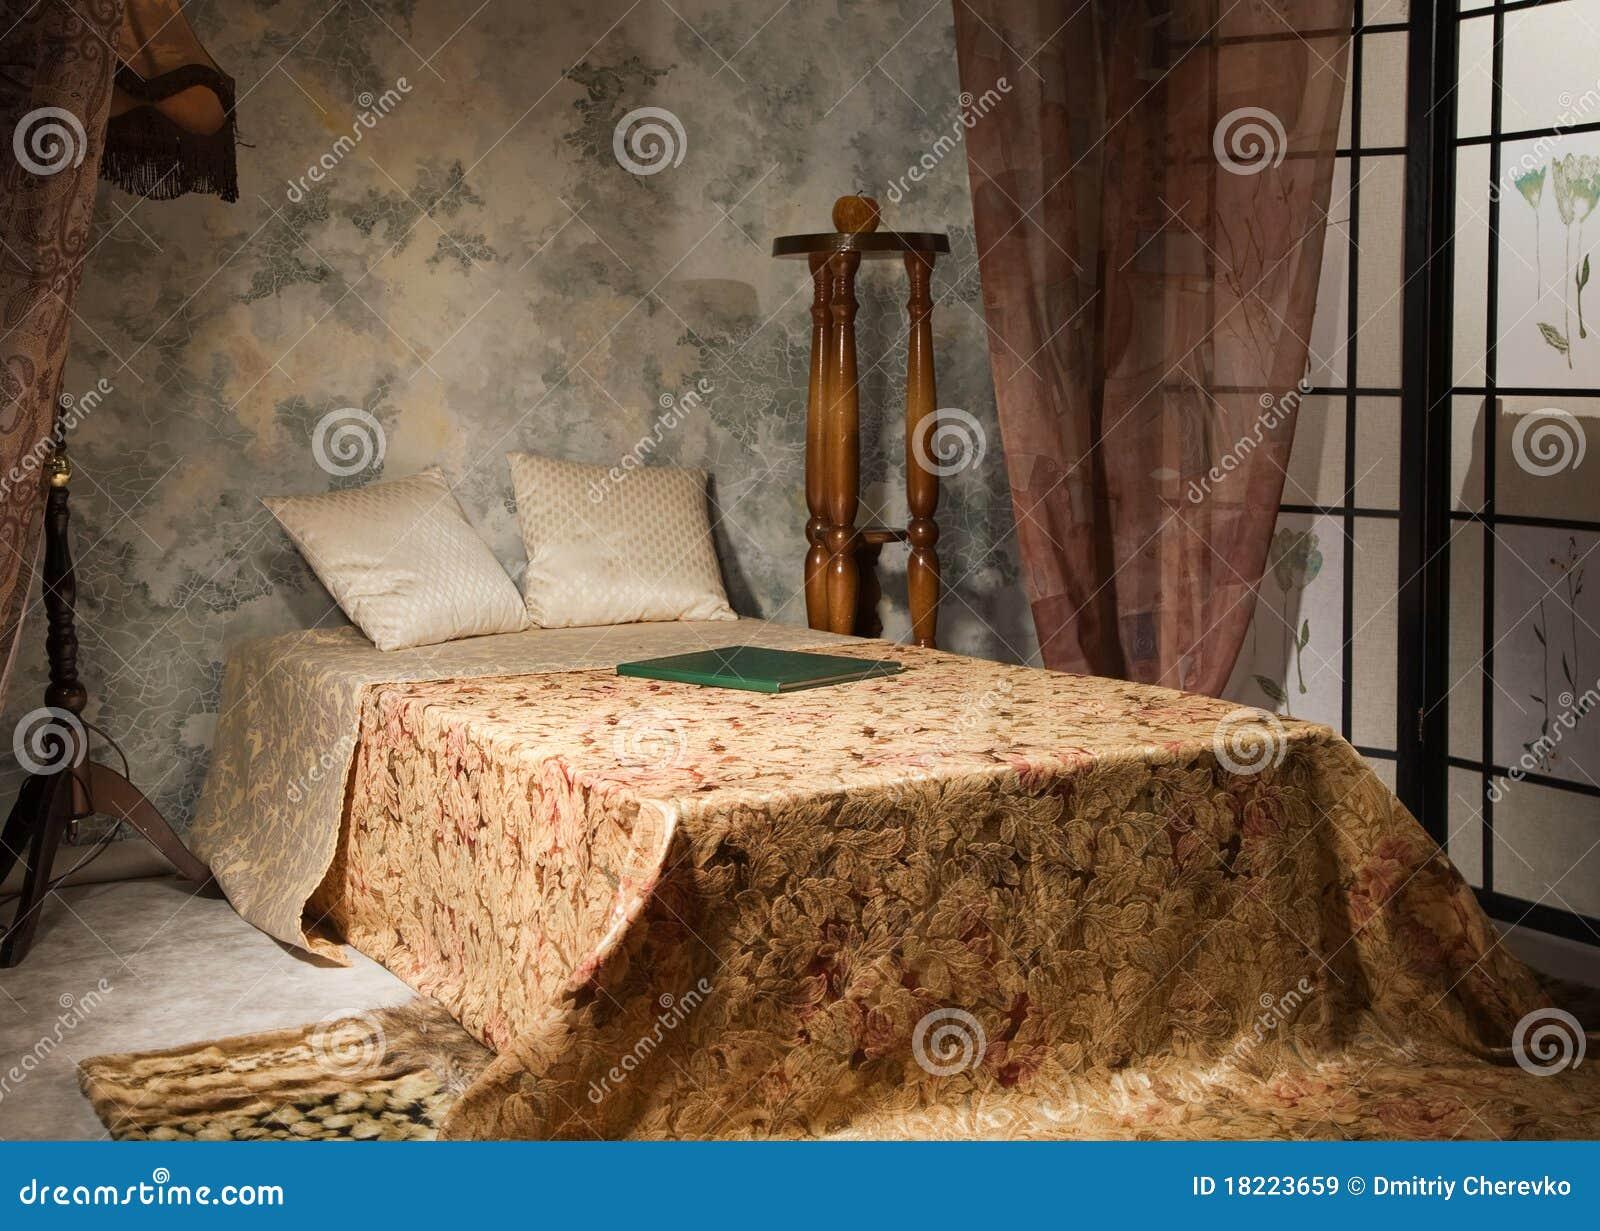 bedroom interior in the vintage style stock image image. Black Bedroom Furniture Sets. Home Design Ideas